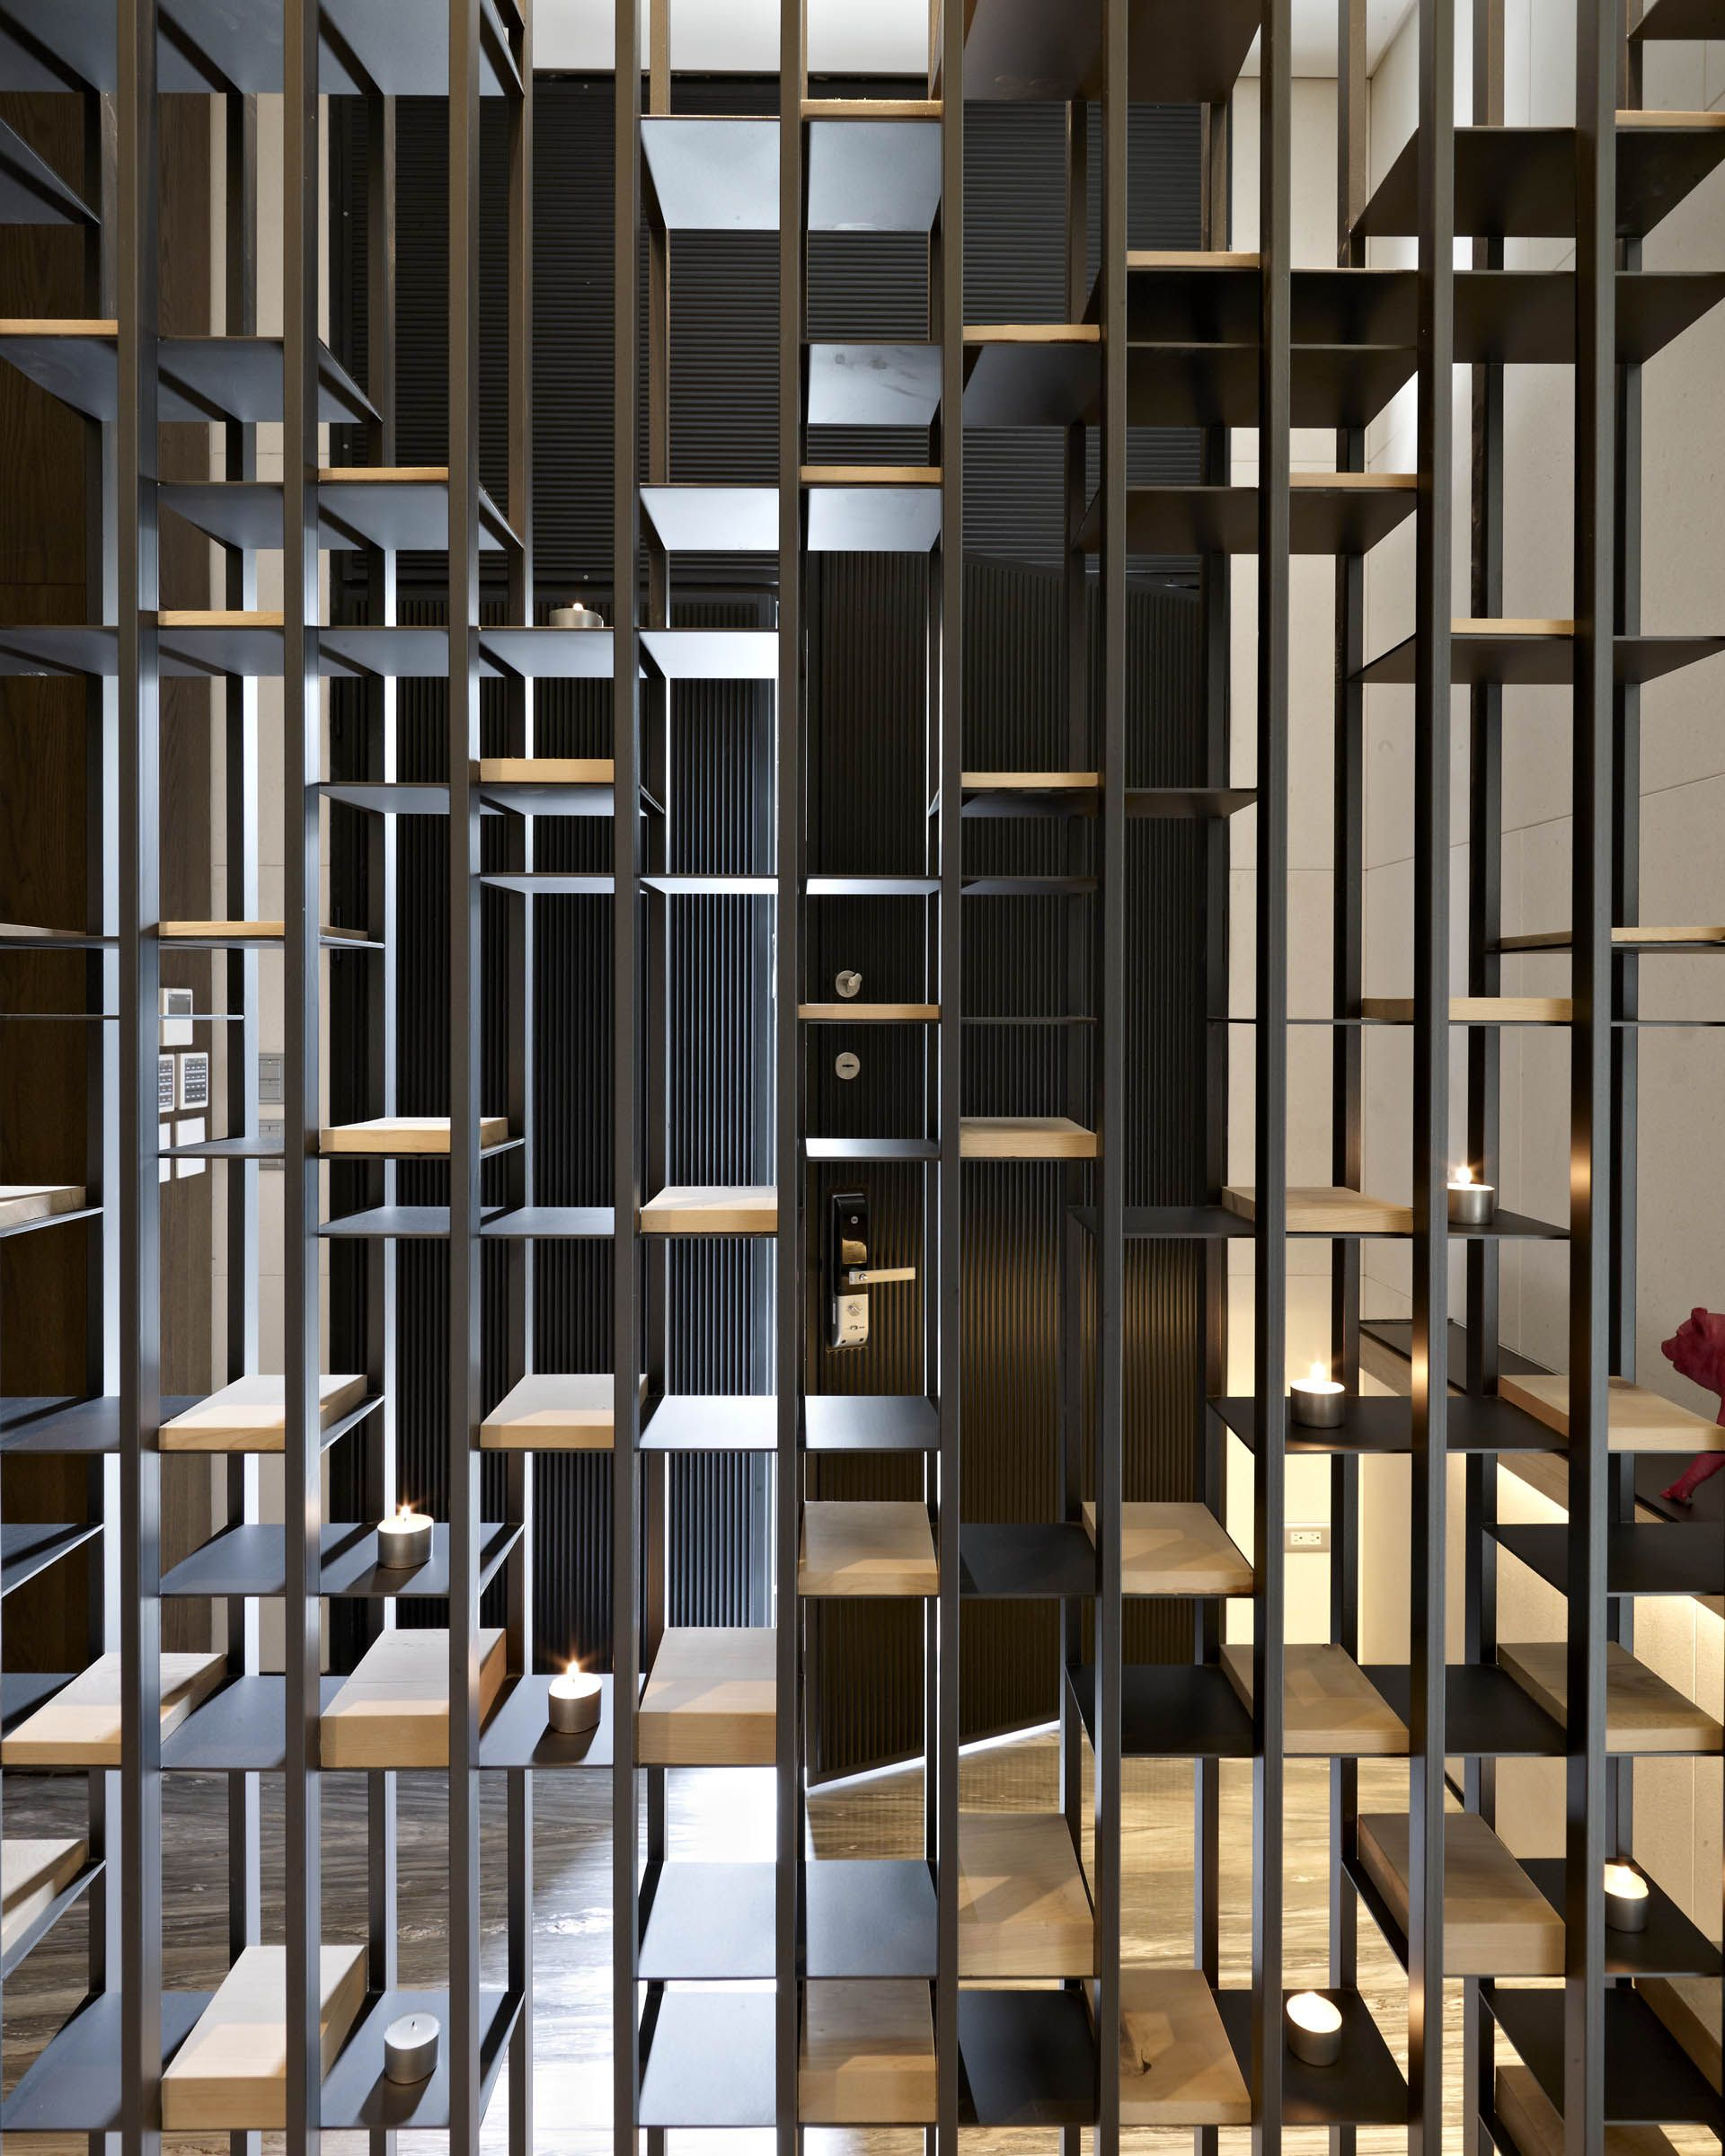 Chinese Restaurant, Restaurant Bar, Hotel Lobby, Lobbies, Shelf, Shelves, Entrees,